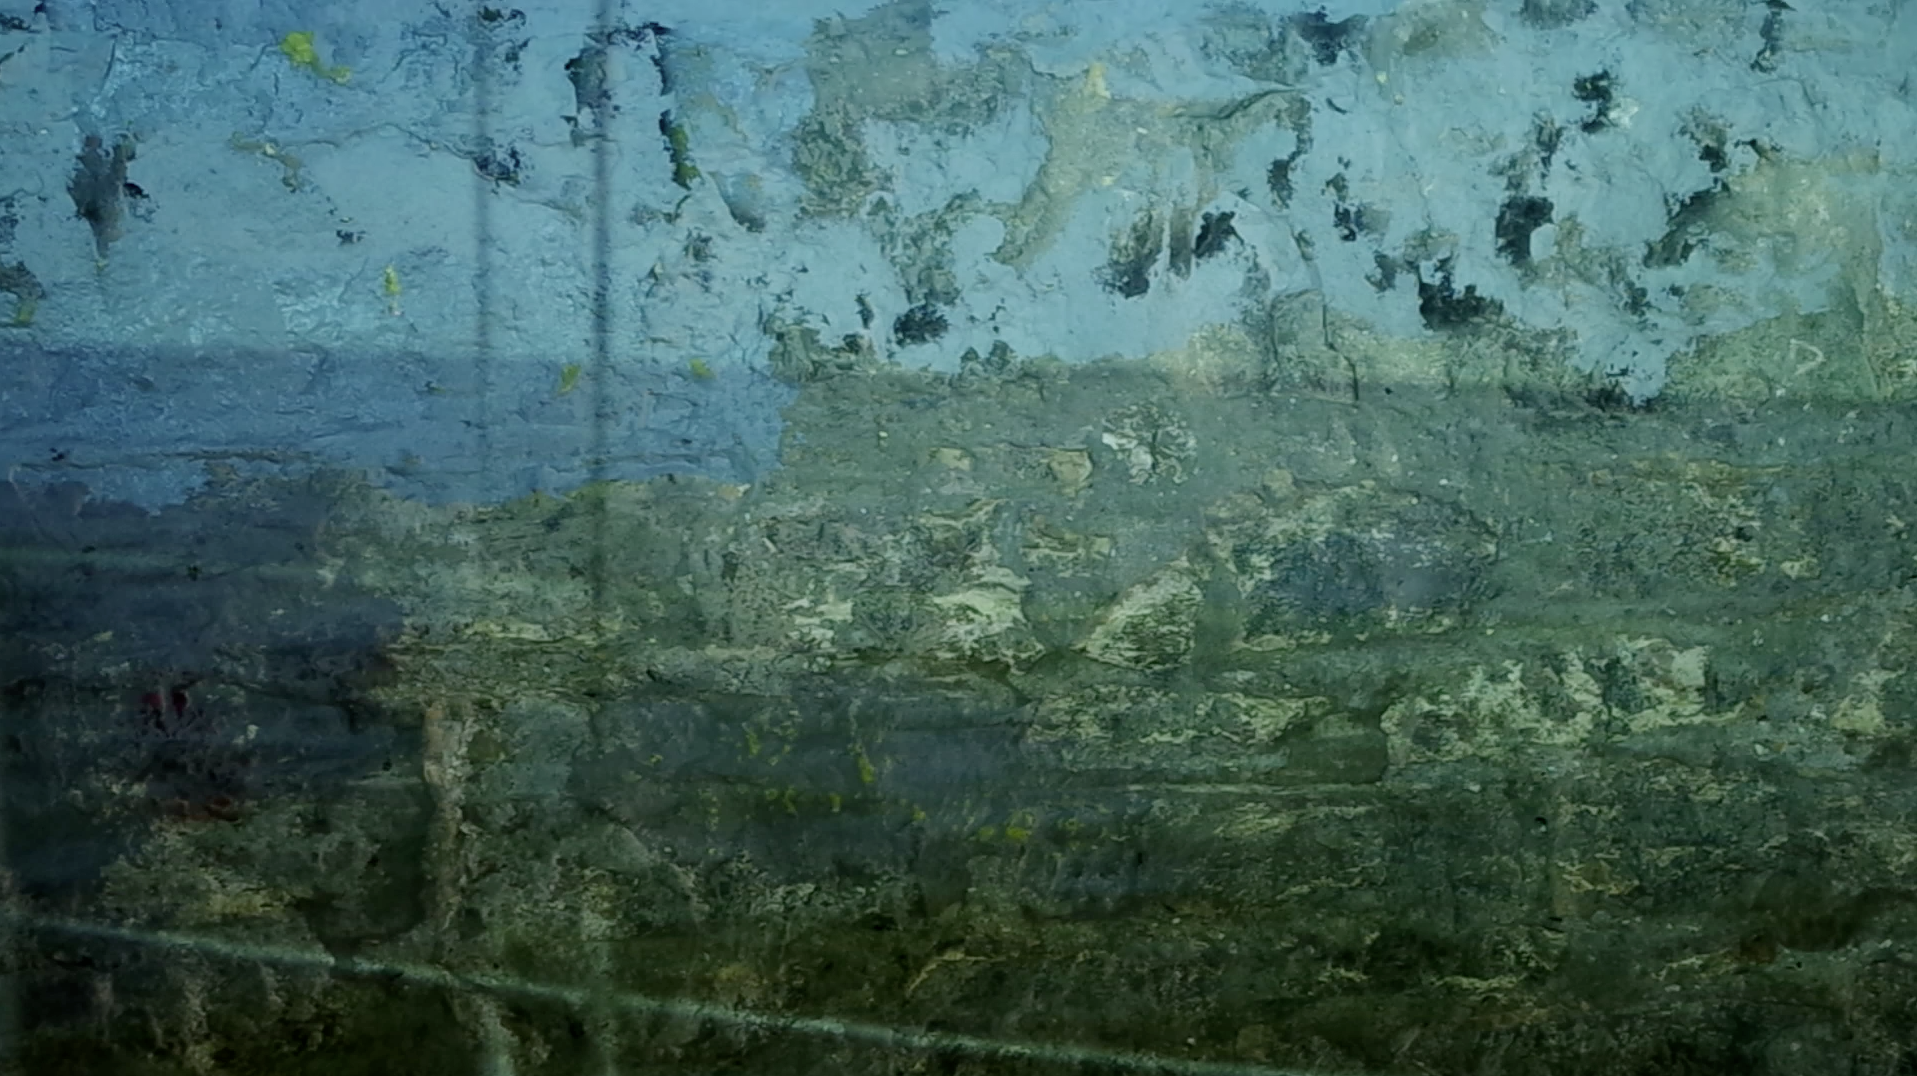 Sailing, video installation, 2014. Image by Sasha Amaya.